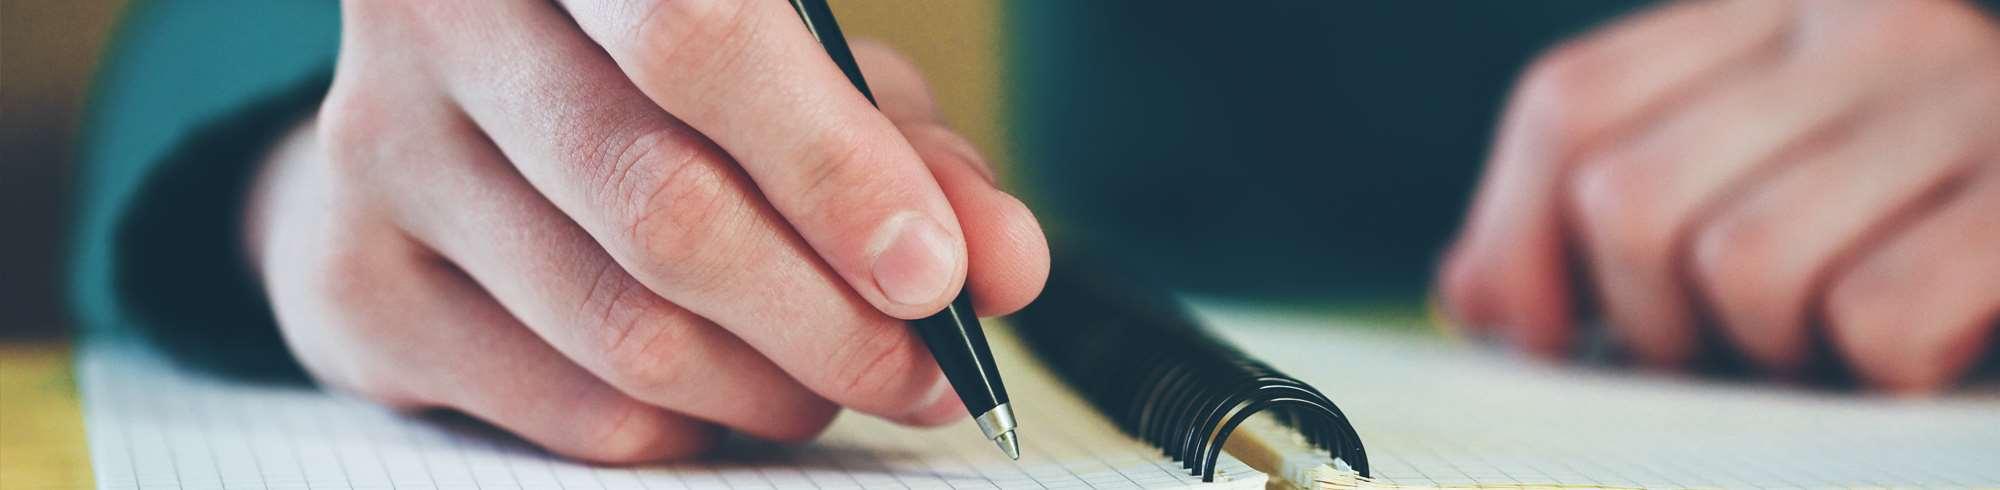 Bid writing services courses uk